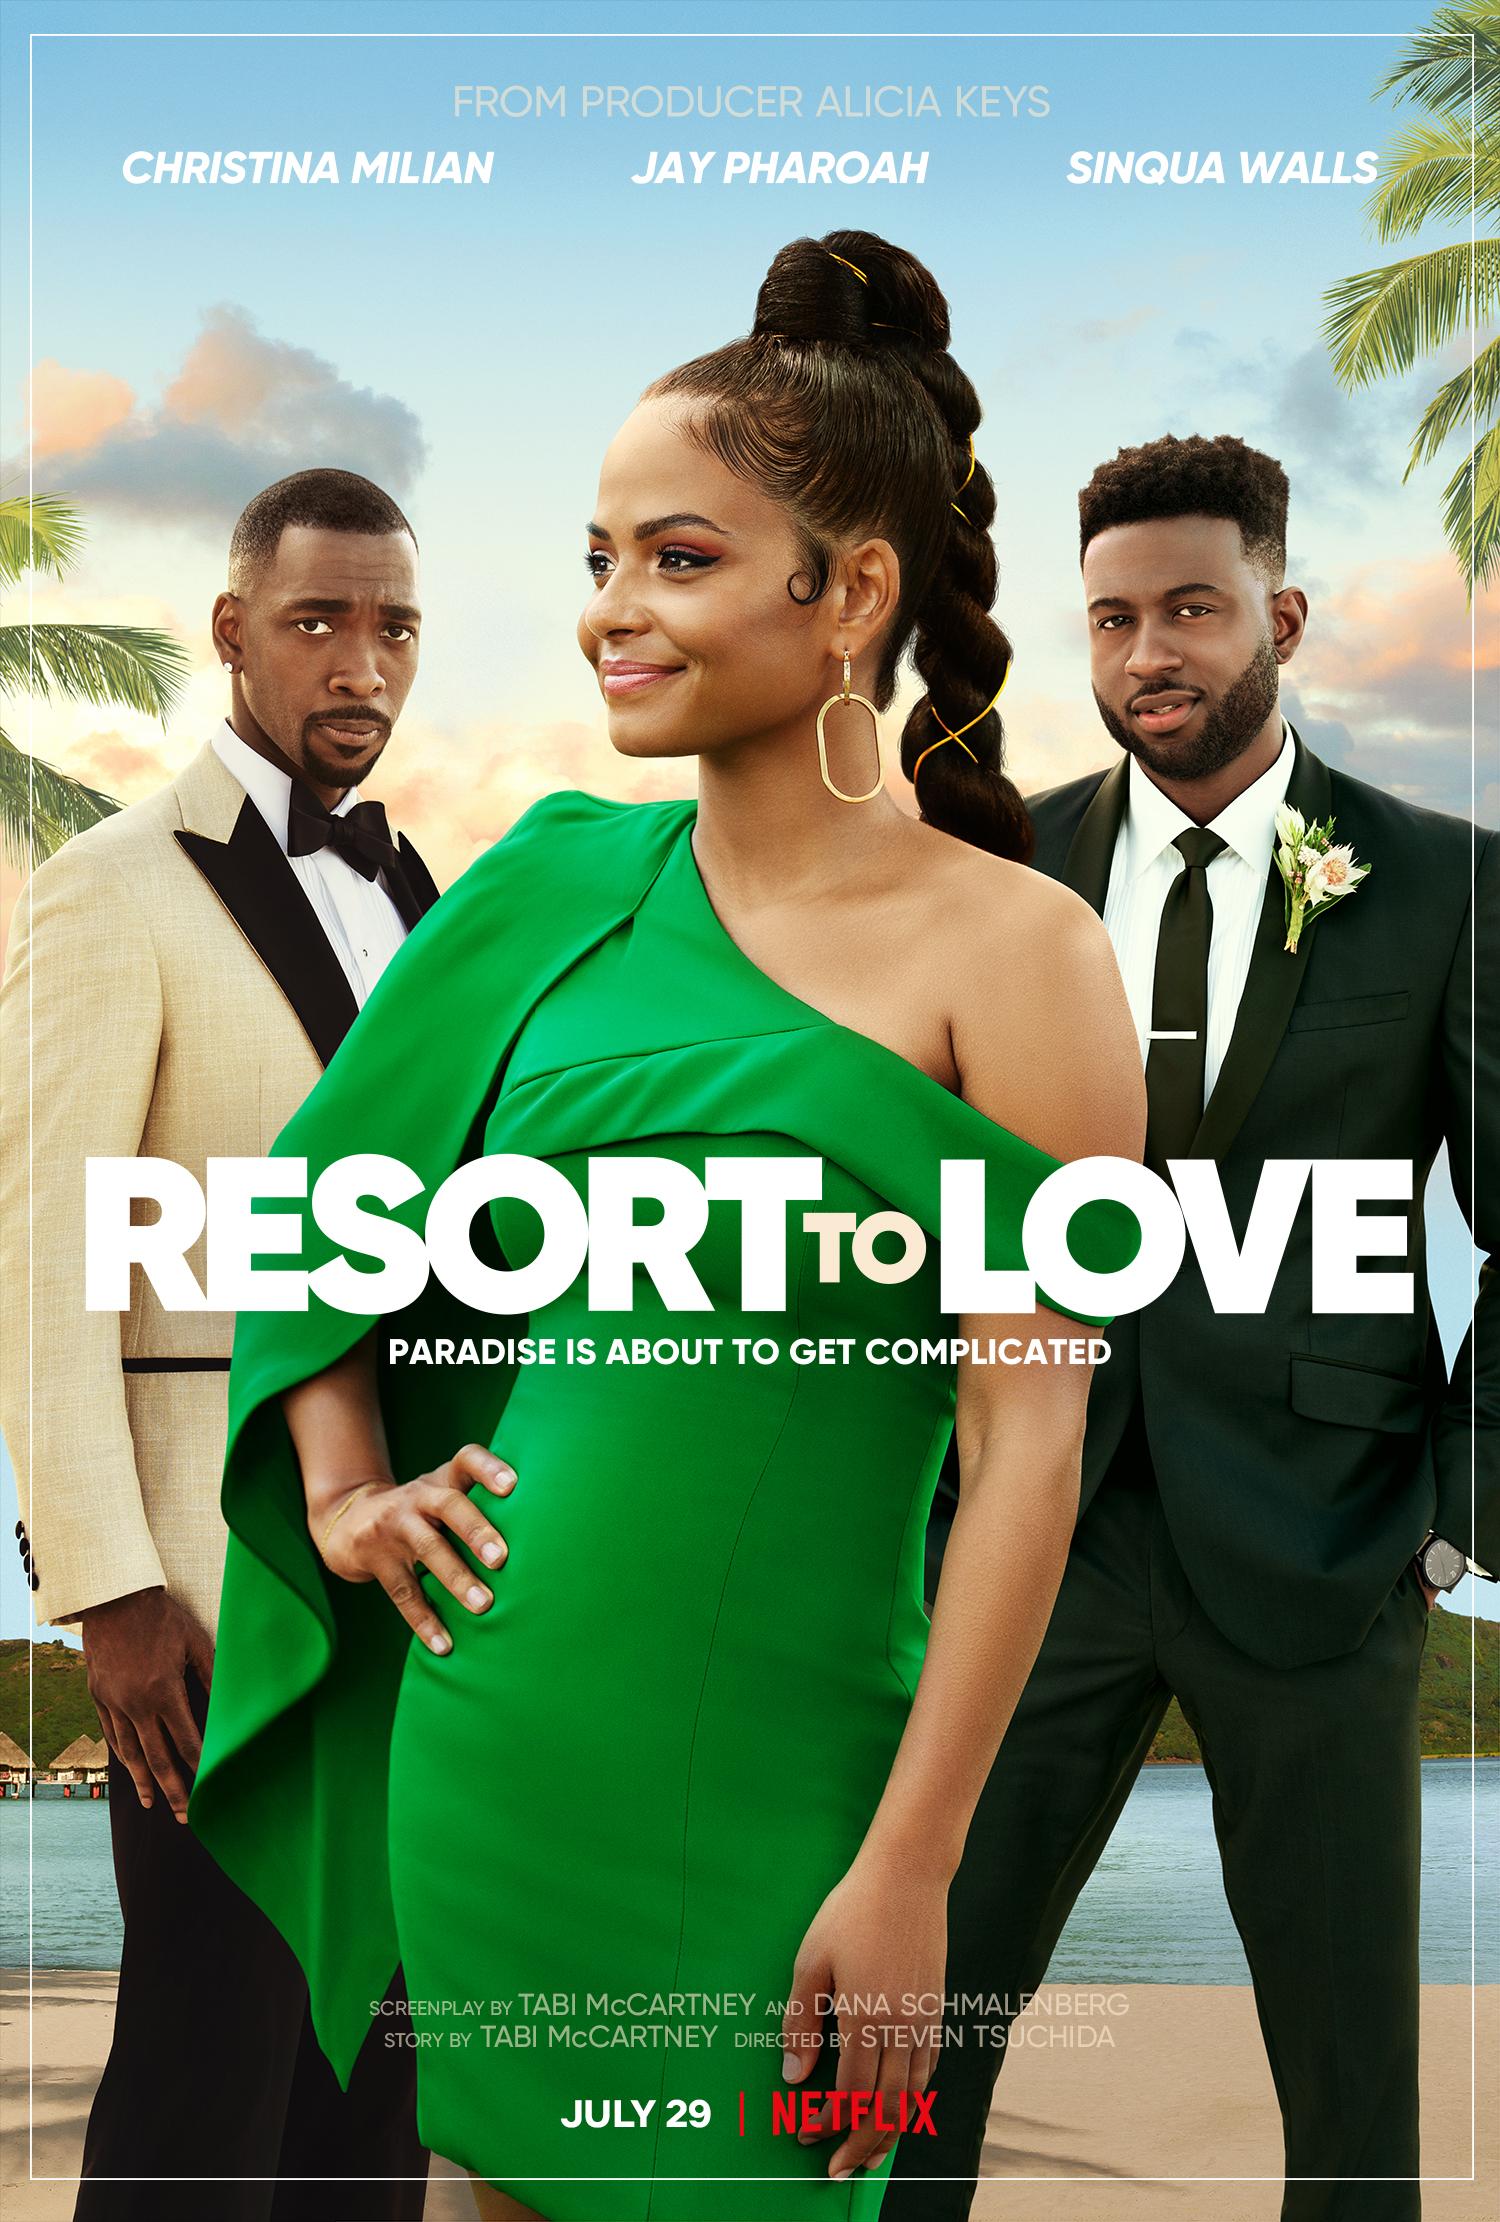 New Movie: Netflix's Resort To Love Starring Christina Milian